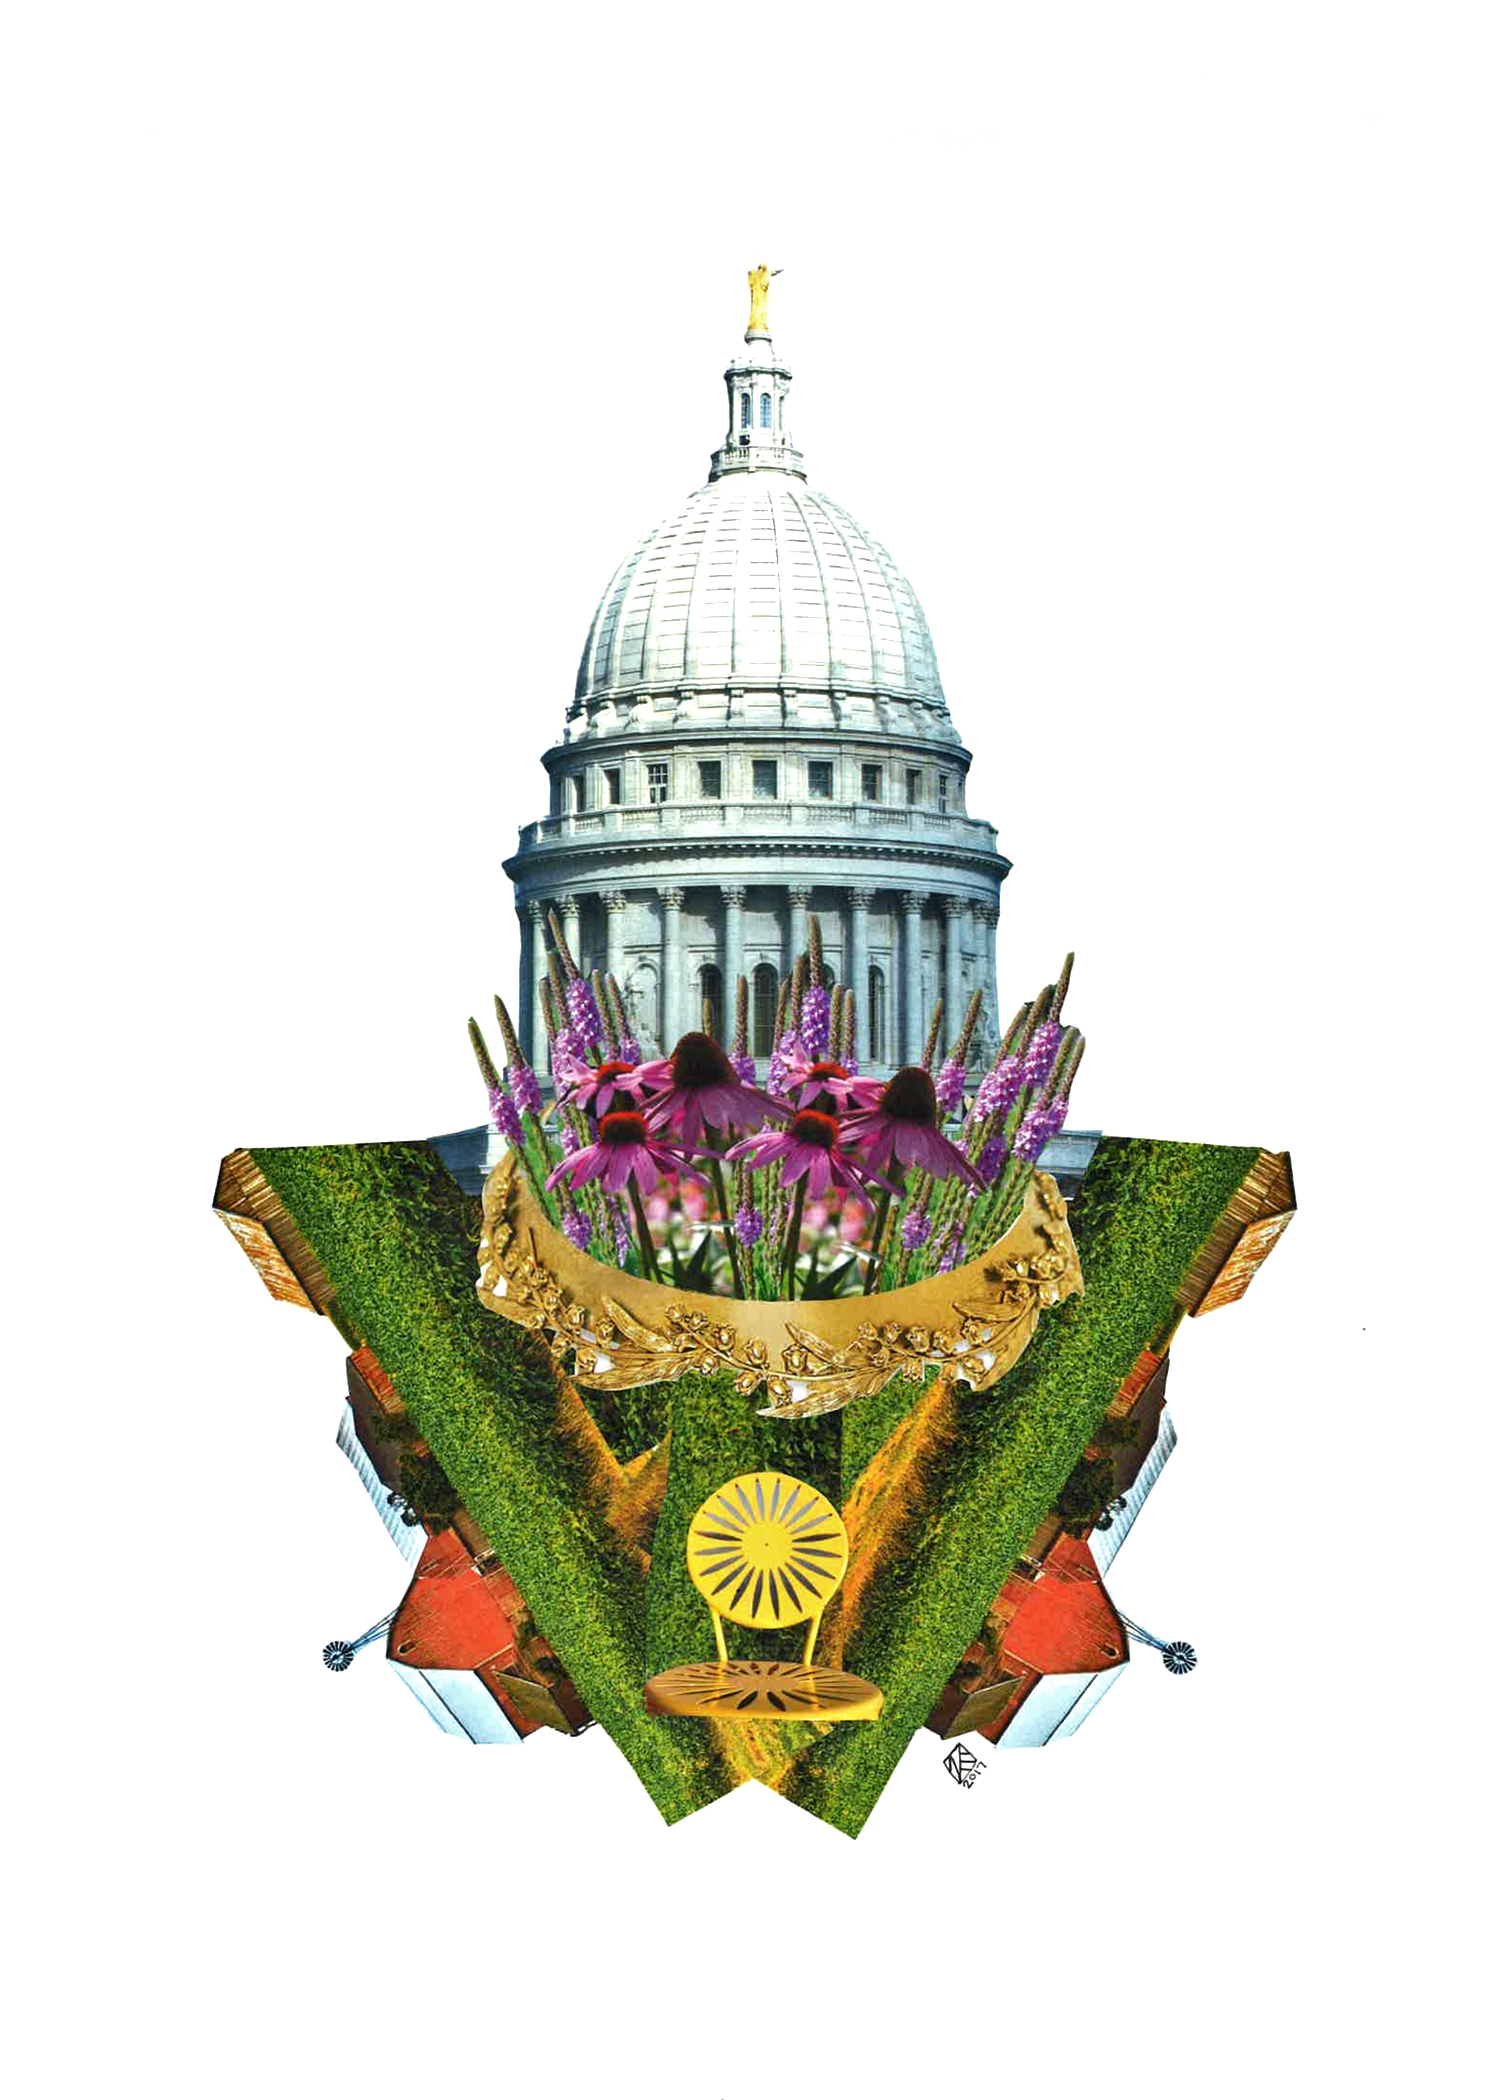 Capitol Seasons: Summer, 11x14, 2017